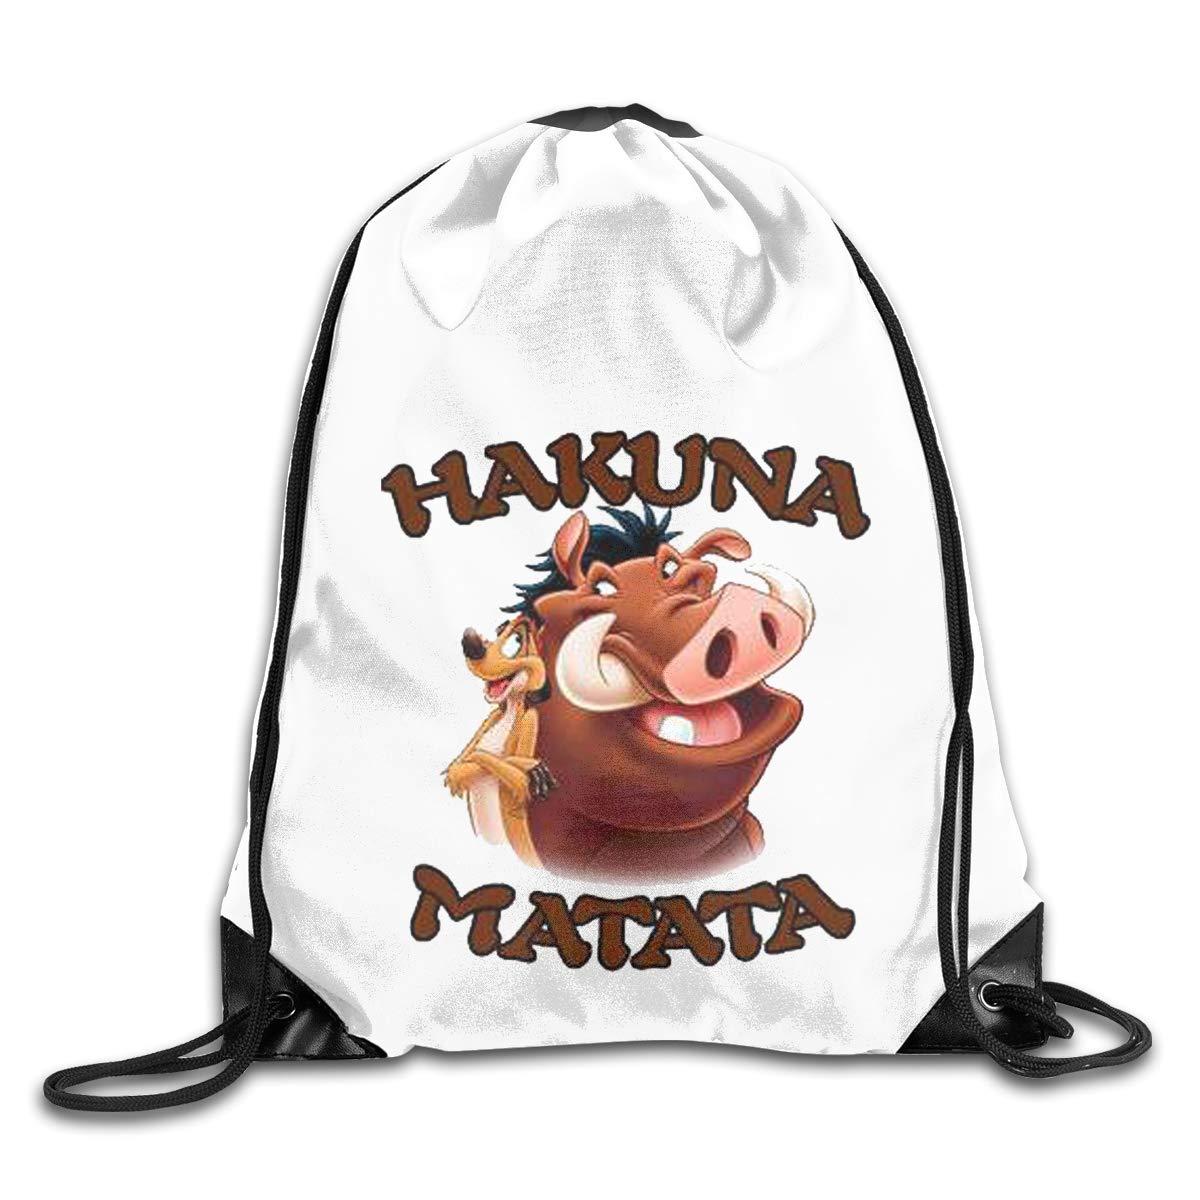 Lion King Hakuna Matata Drawstring Bags Eat Sleep Dance Repeat Beam Mouth Backpack Basketball Tennis Gympack